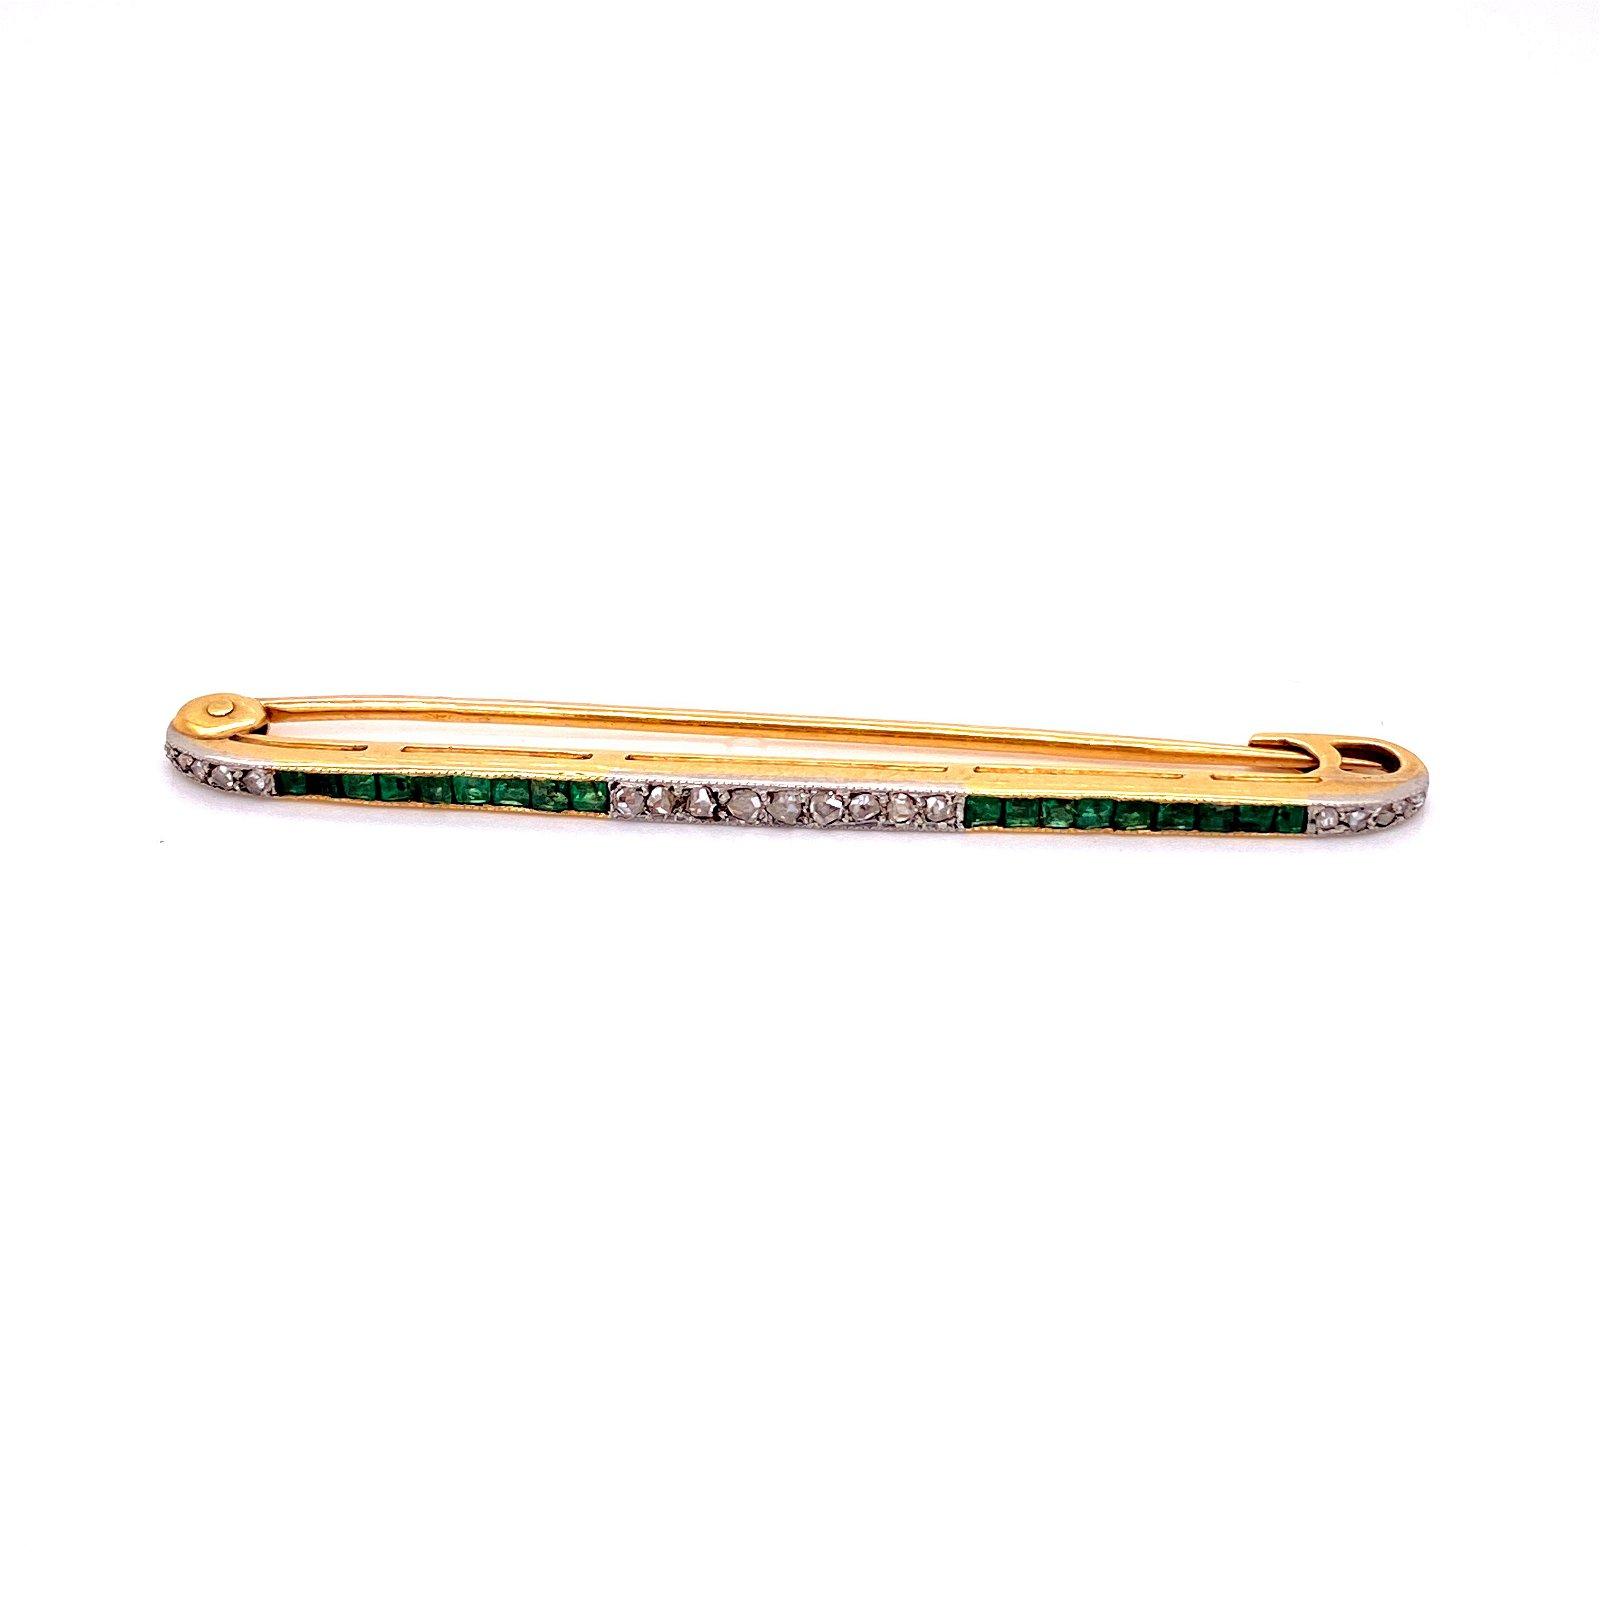 Edwardian French 18k Gold Diamonds Emerald Brooch